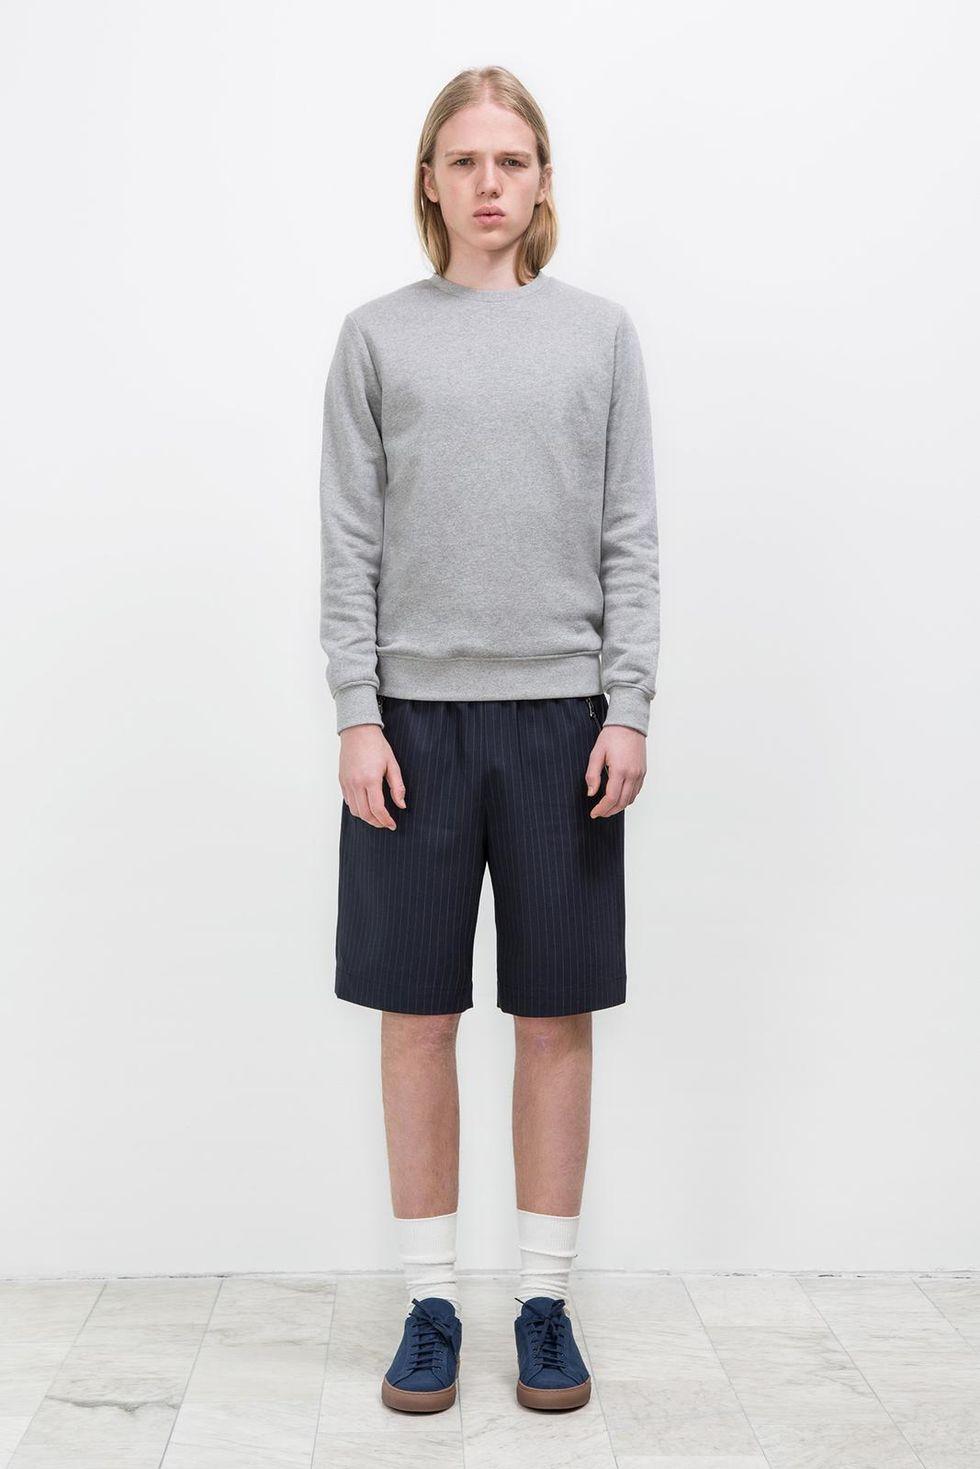 tres-bien-menswear-collection-spring-summer-2015-09.jpg